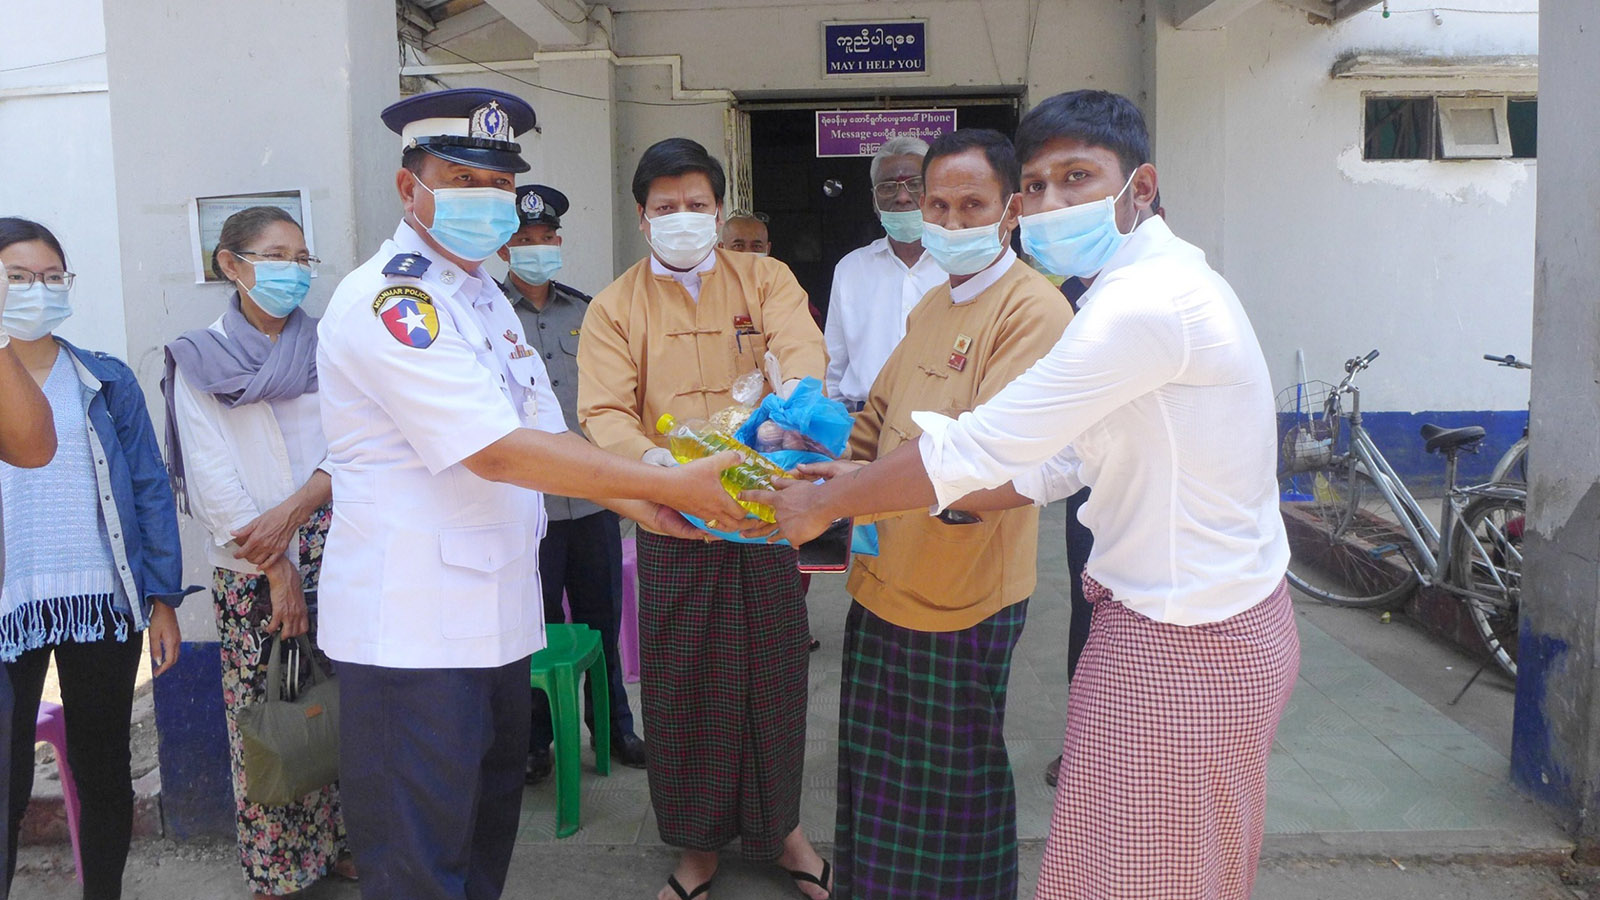 A man receives food aid from authorities in Dala Township. Photo: Naing Lin Kyaw